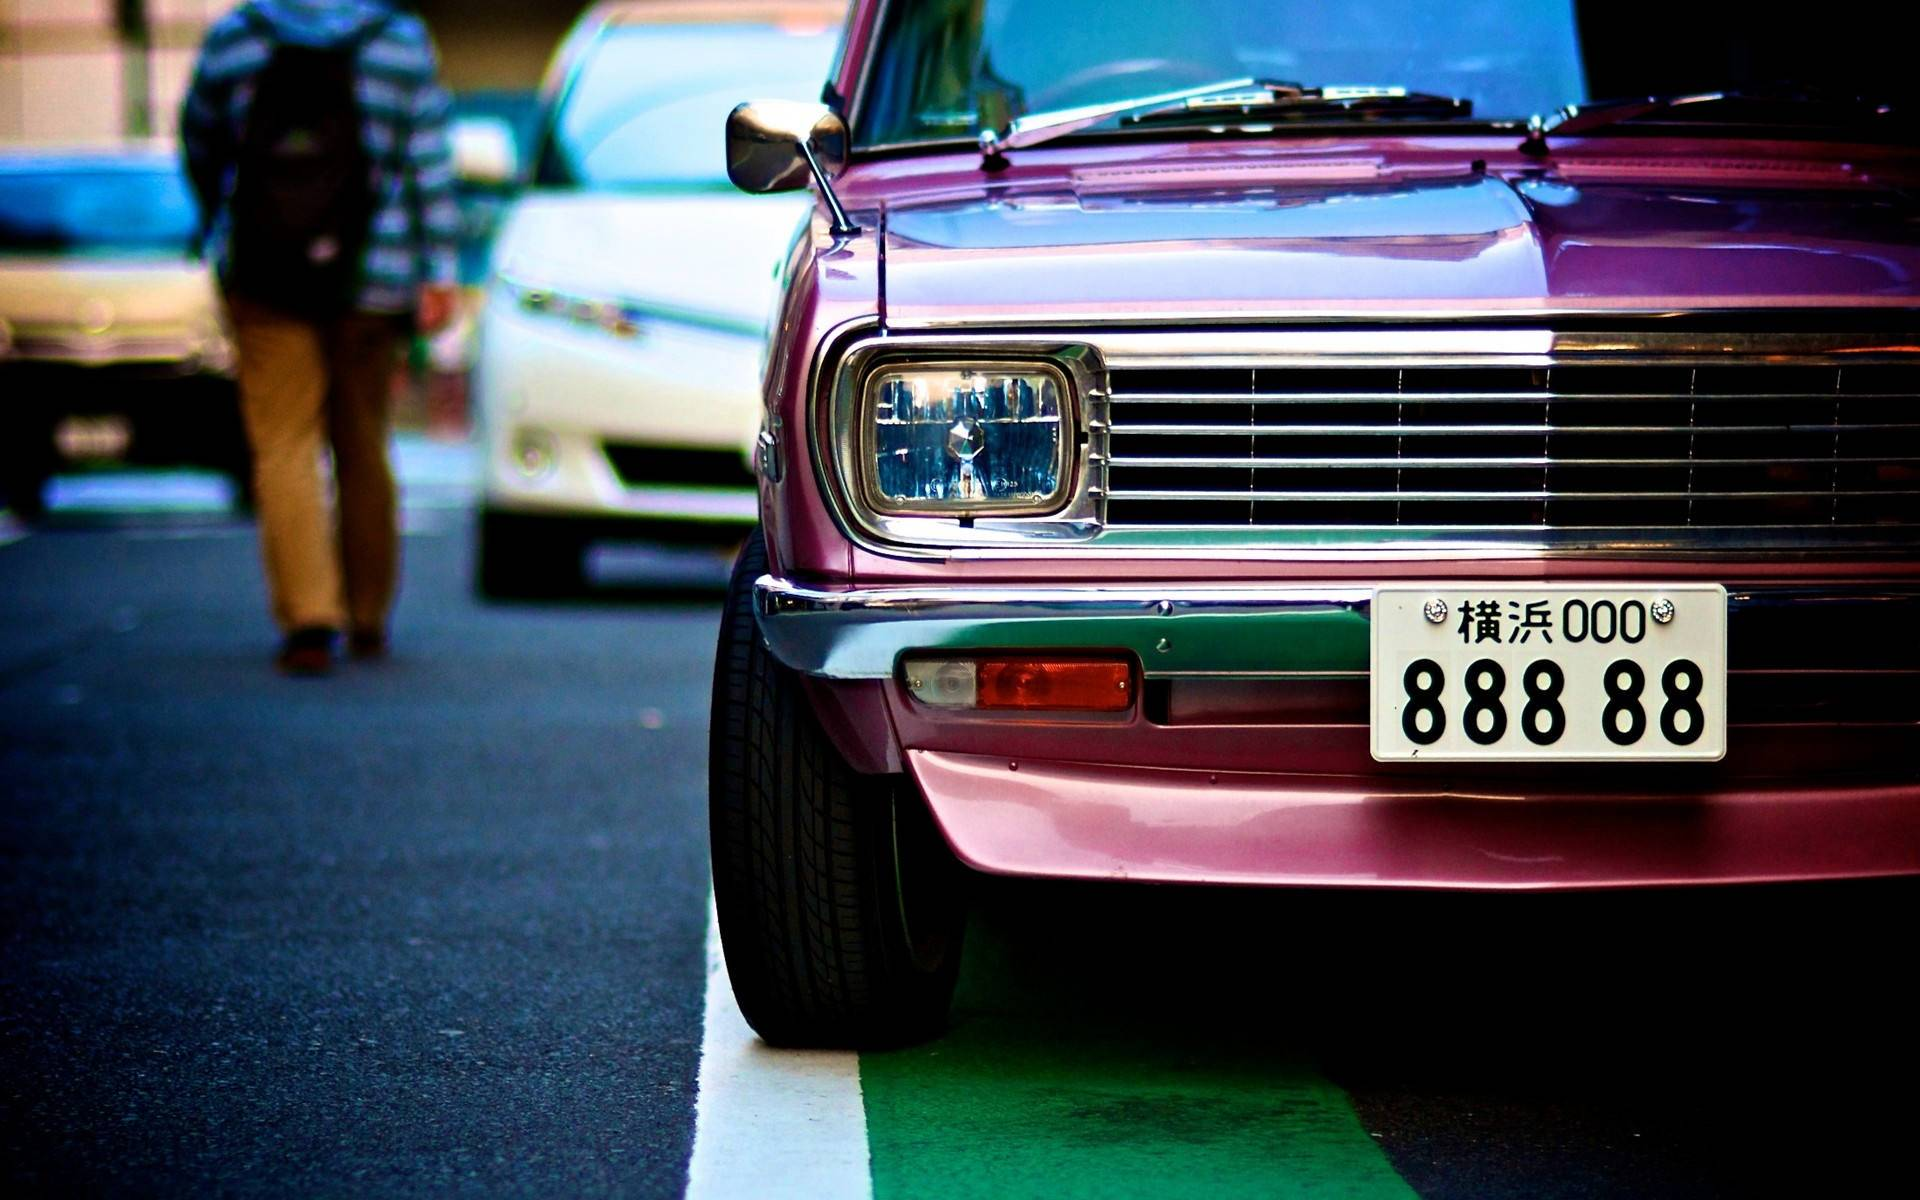 Wallpaper: Classic Cars Wallpapers